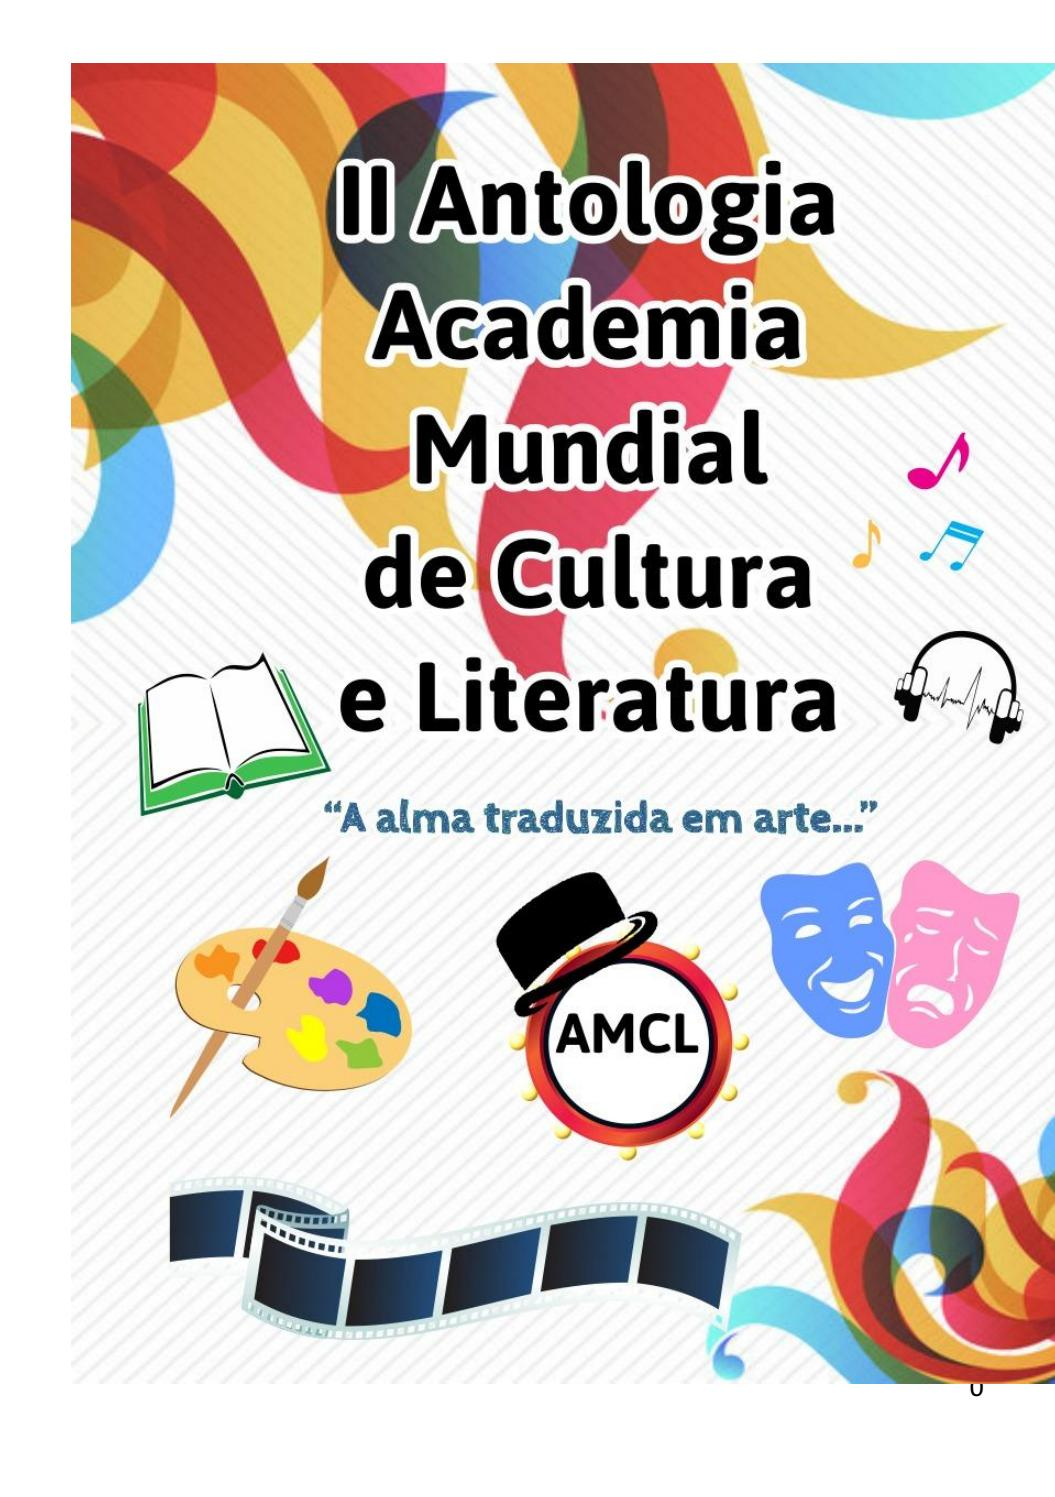 f371836a0 II Antologia Academia Mundial de Cultura e Literatura AMCL – JackMichel  Poema Alma Simbolista by JackMichel - issuu